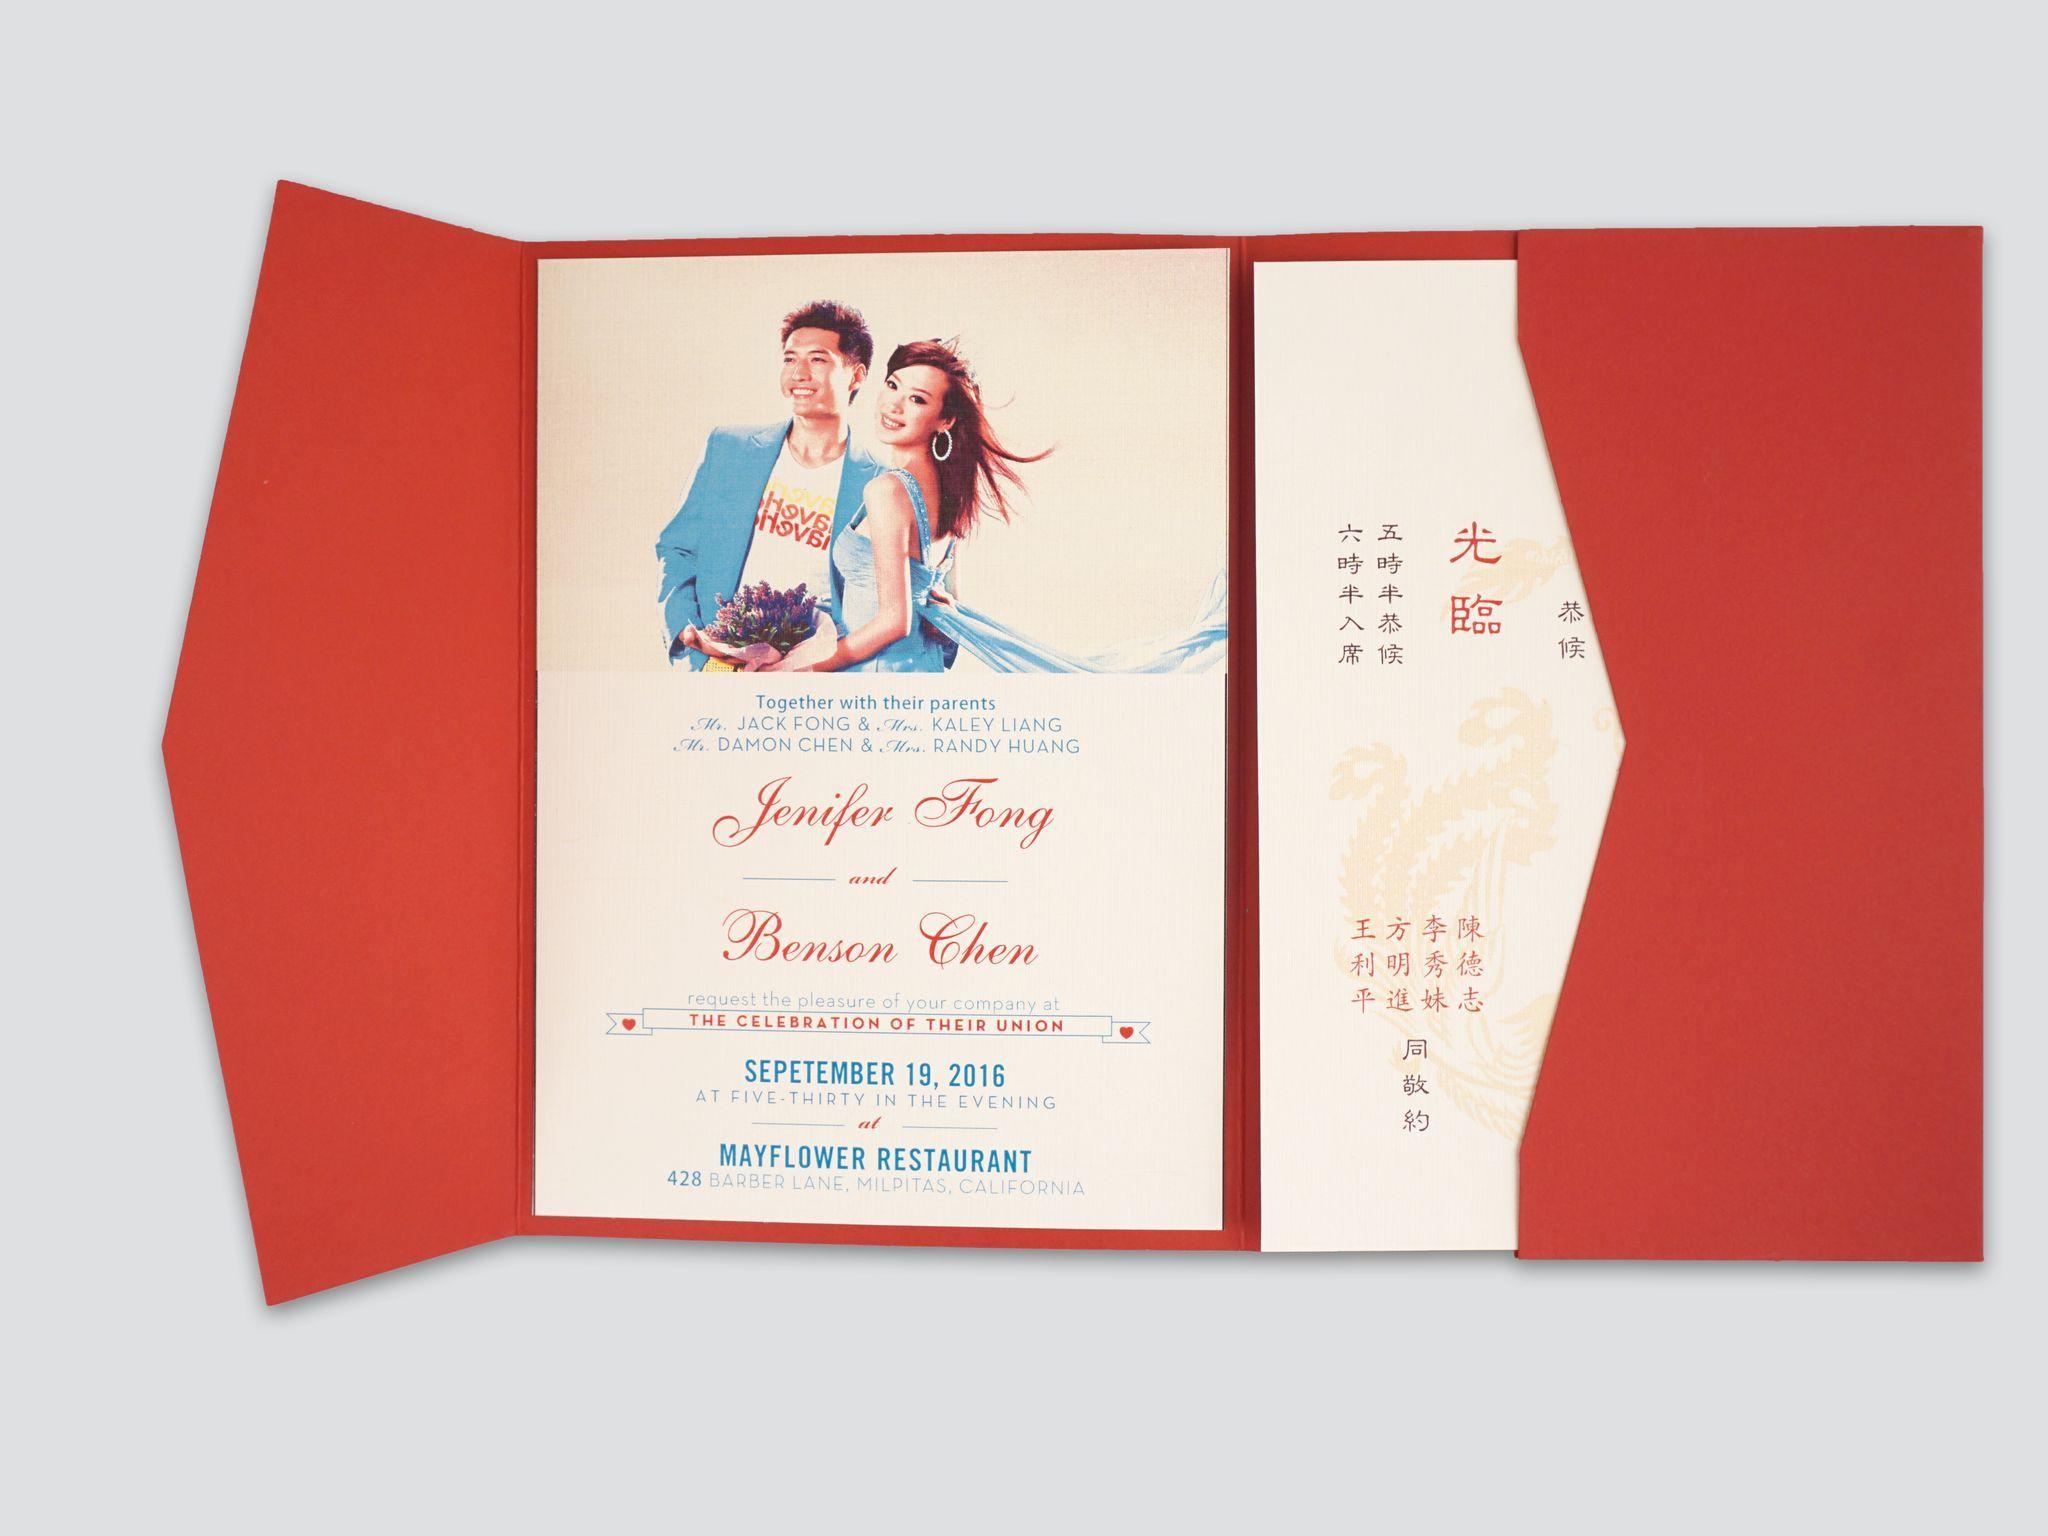 Beautiful Evening Wedding Invitation Wording Photo - Invitations and ...